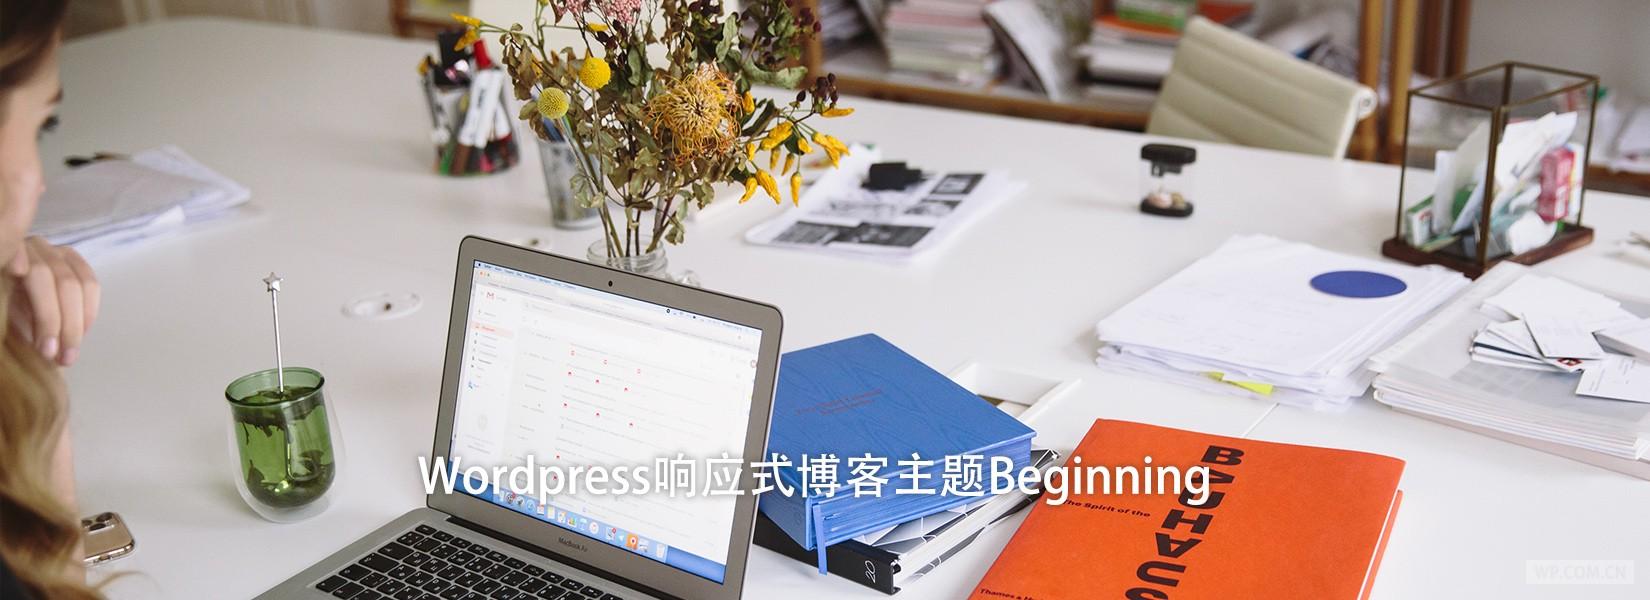 Wordpress响应式博客主题Beginning